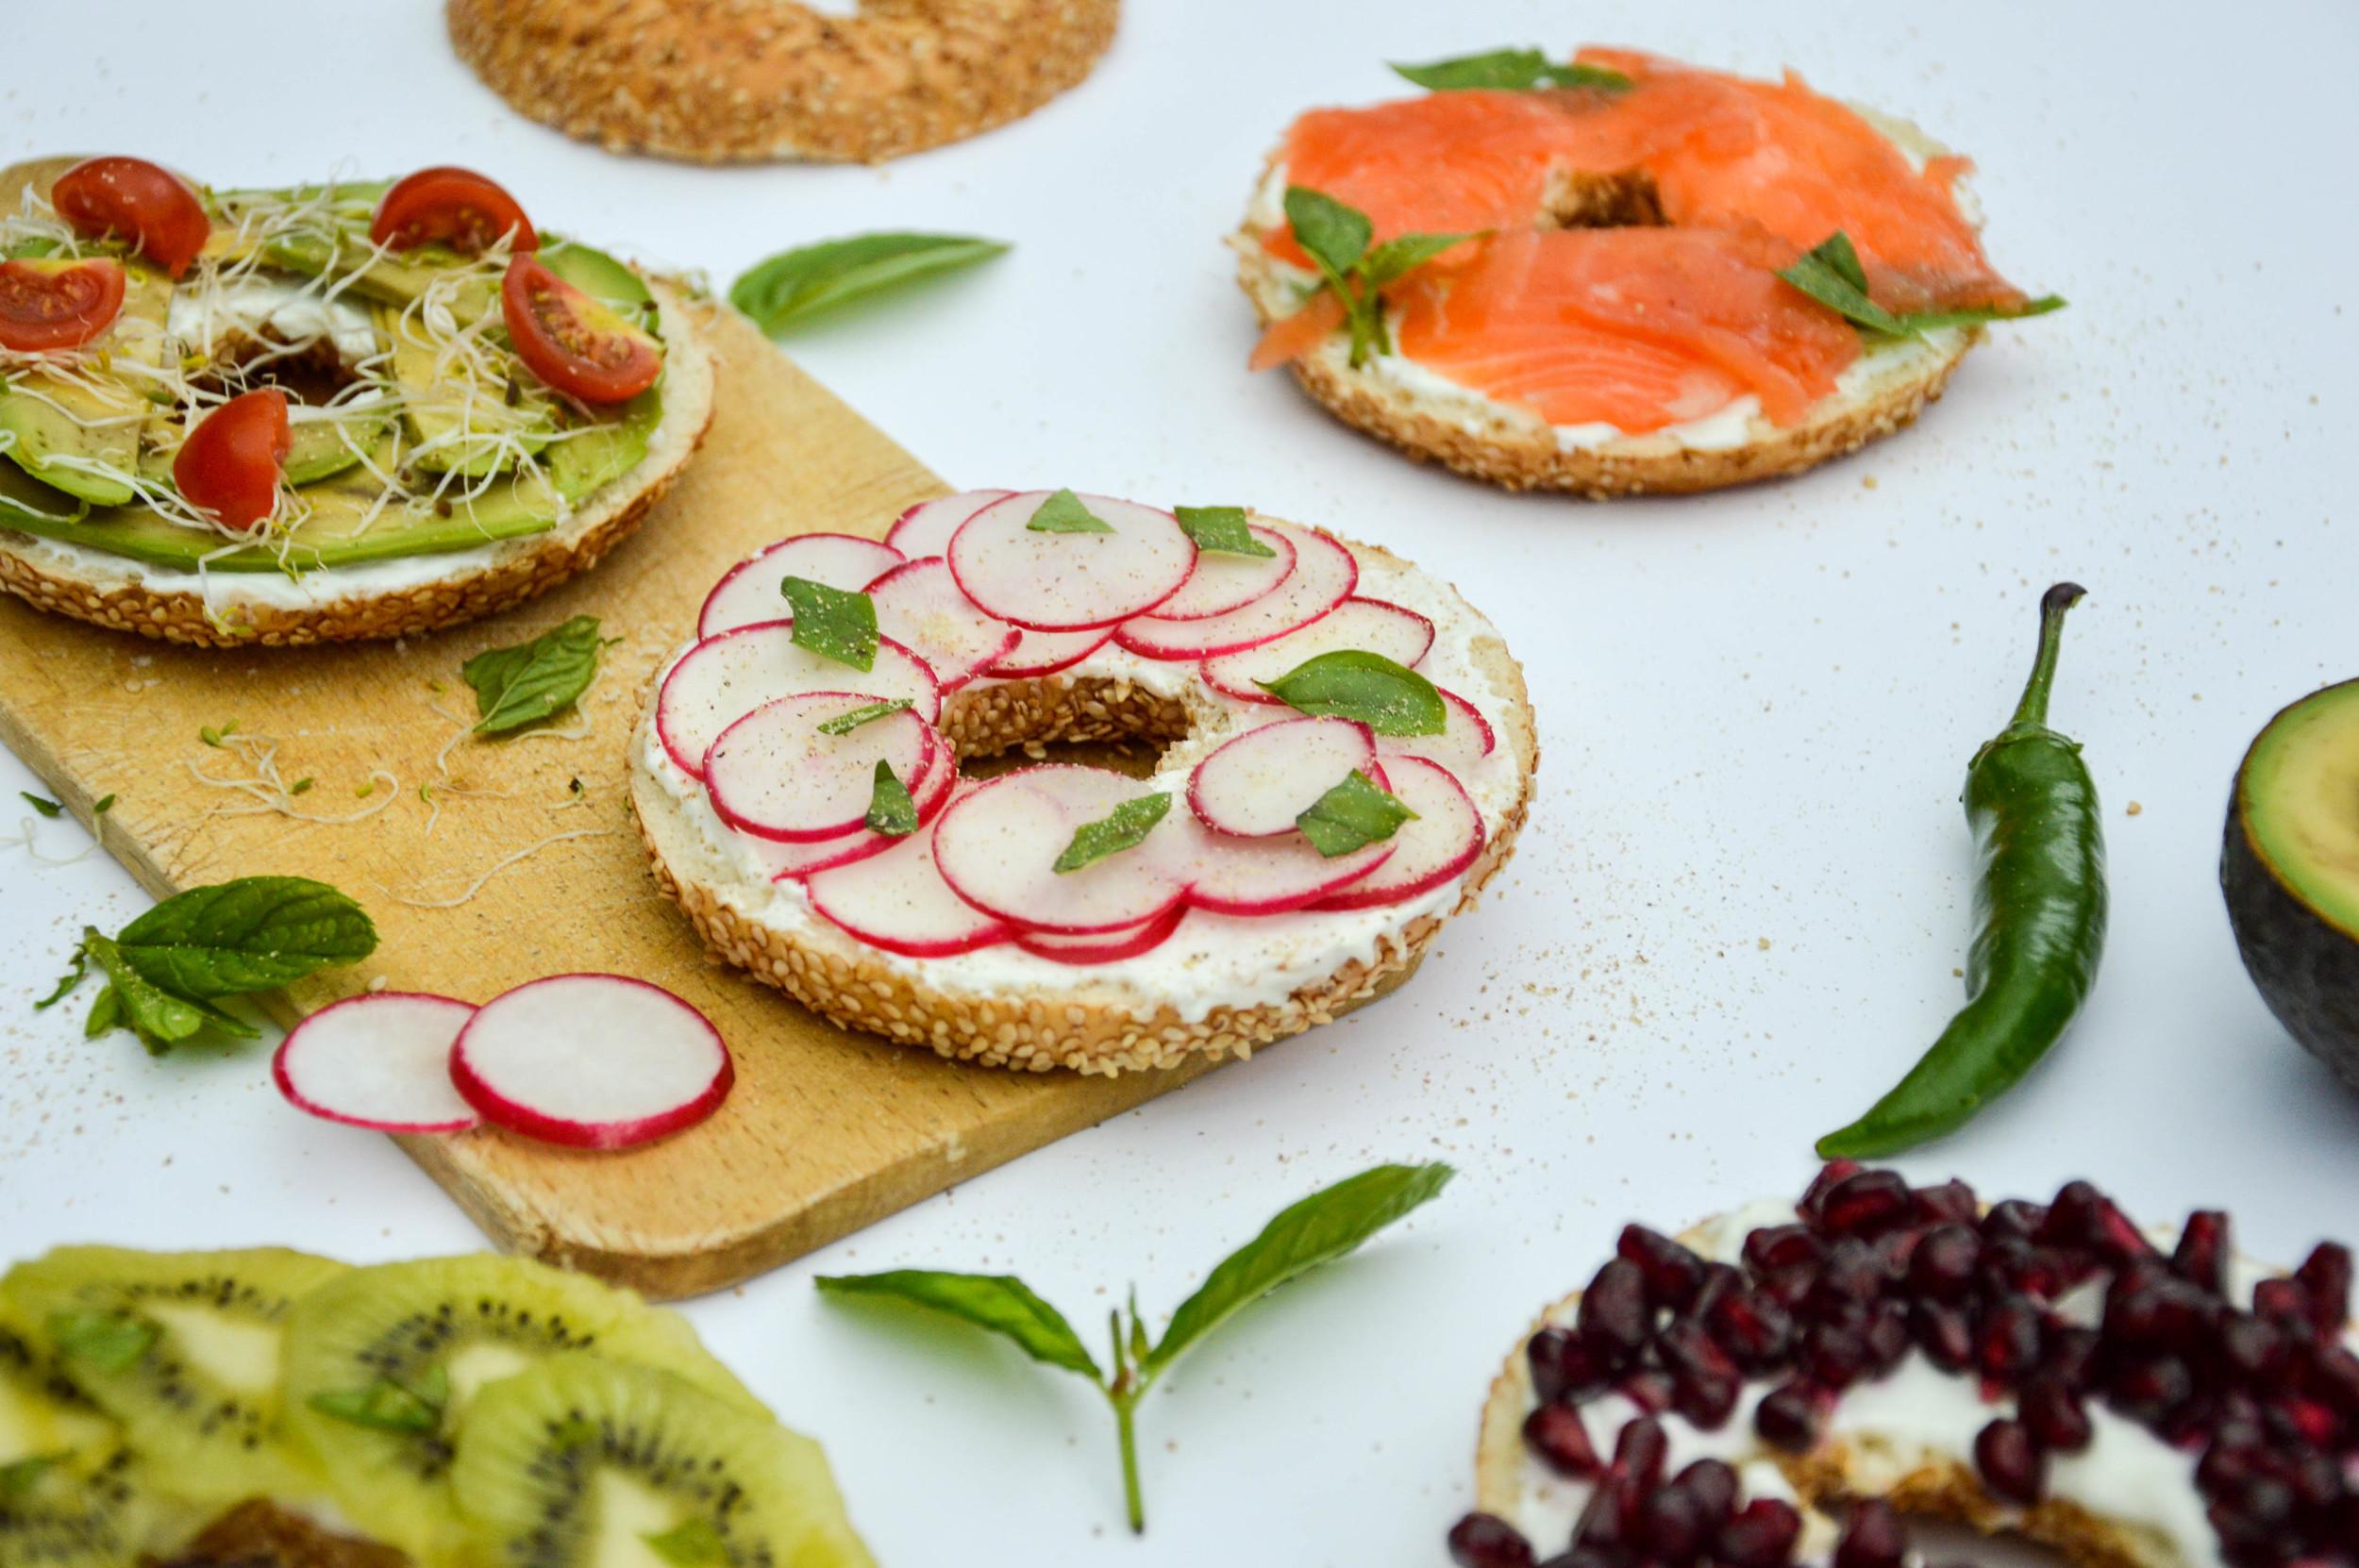 Healthy Bagels - OSIARAH.COM (6 of 8).jpg